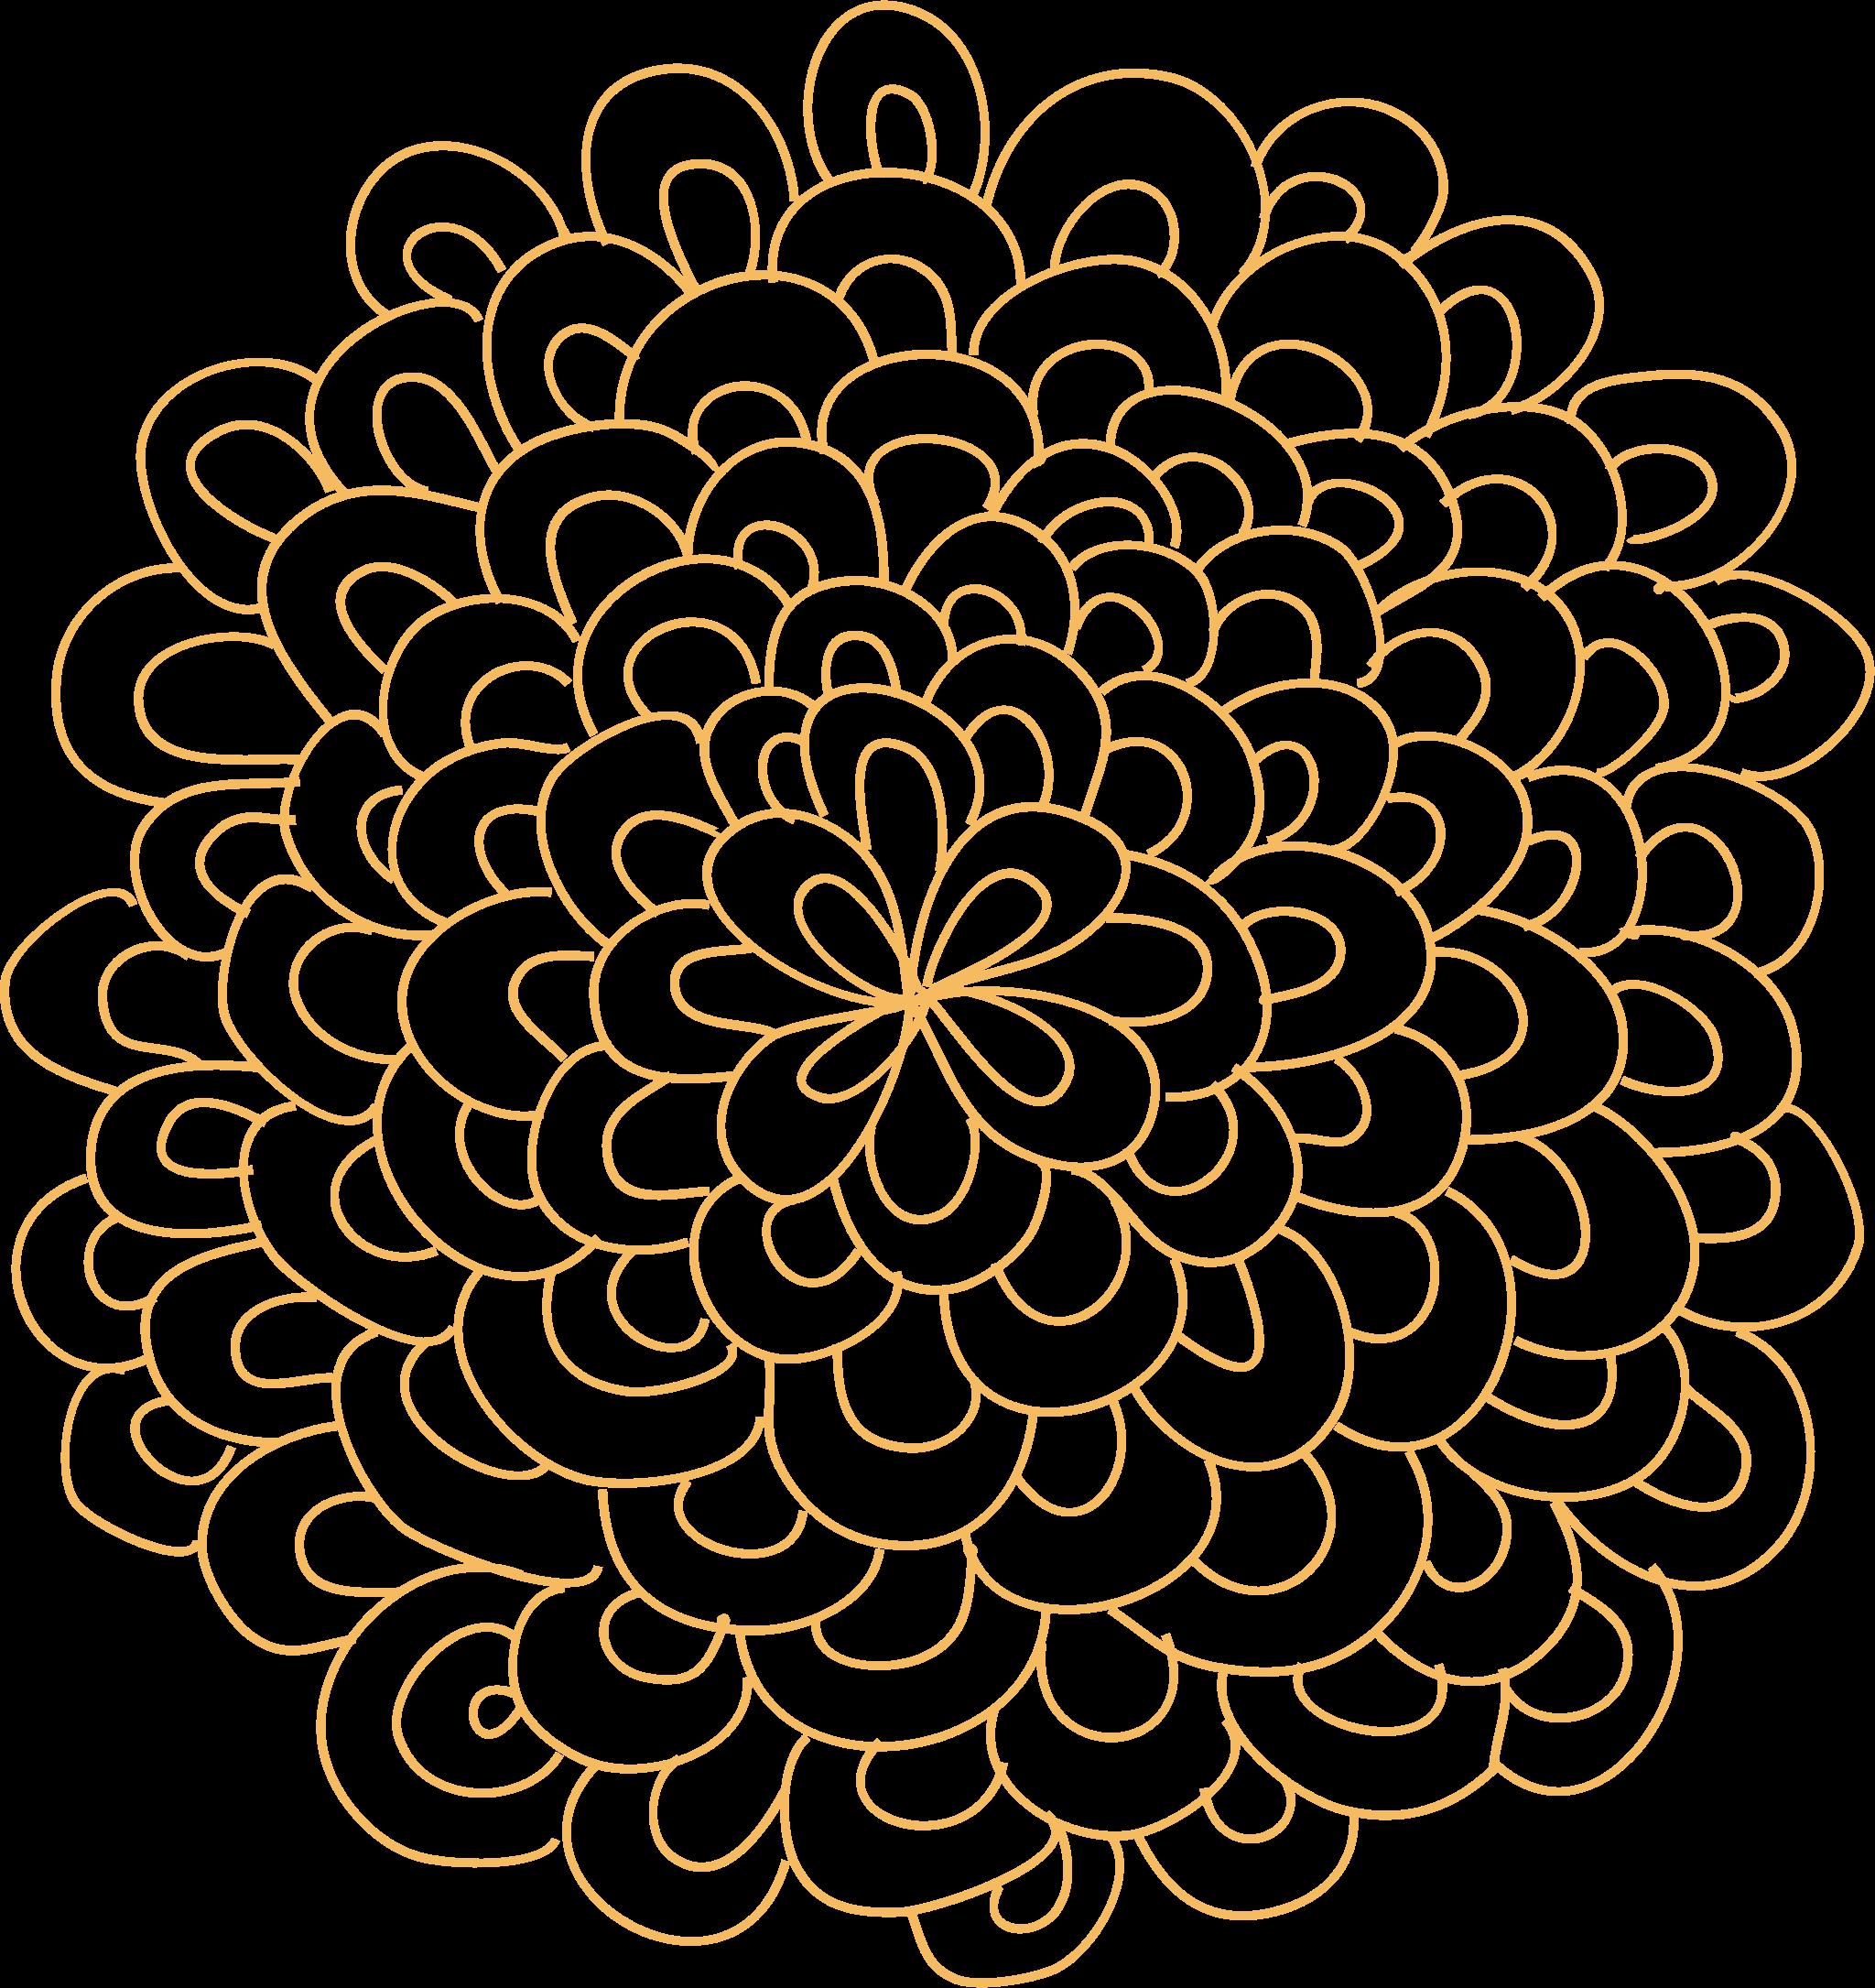 Rosette flower big image. Circle clipart floral